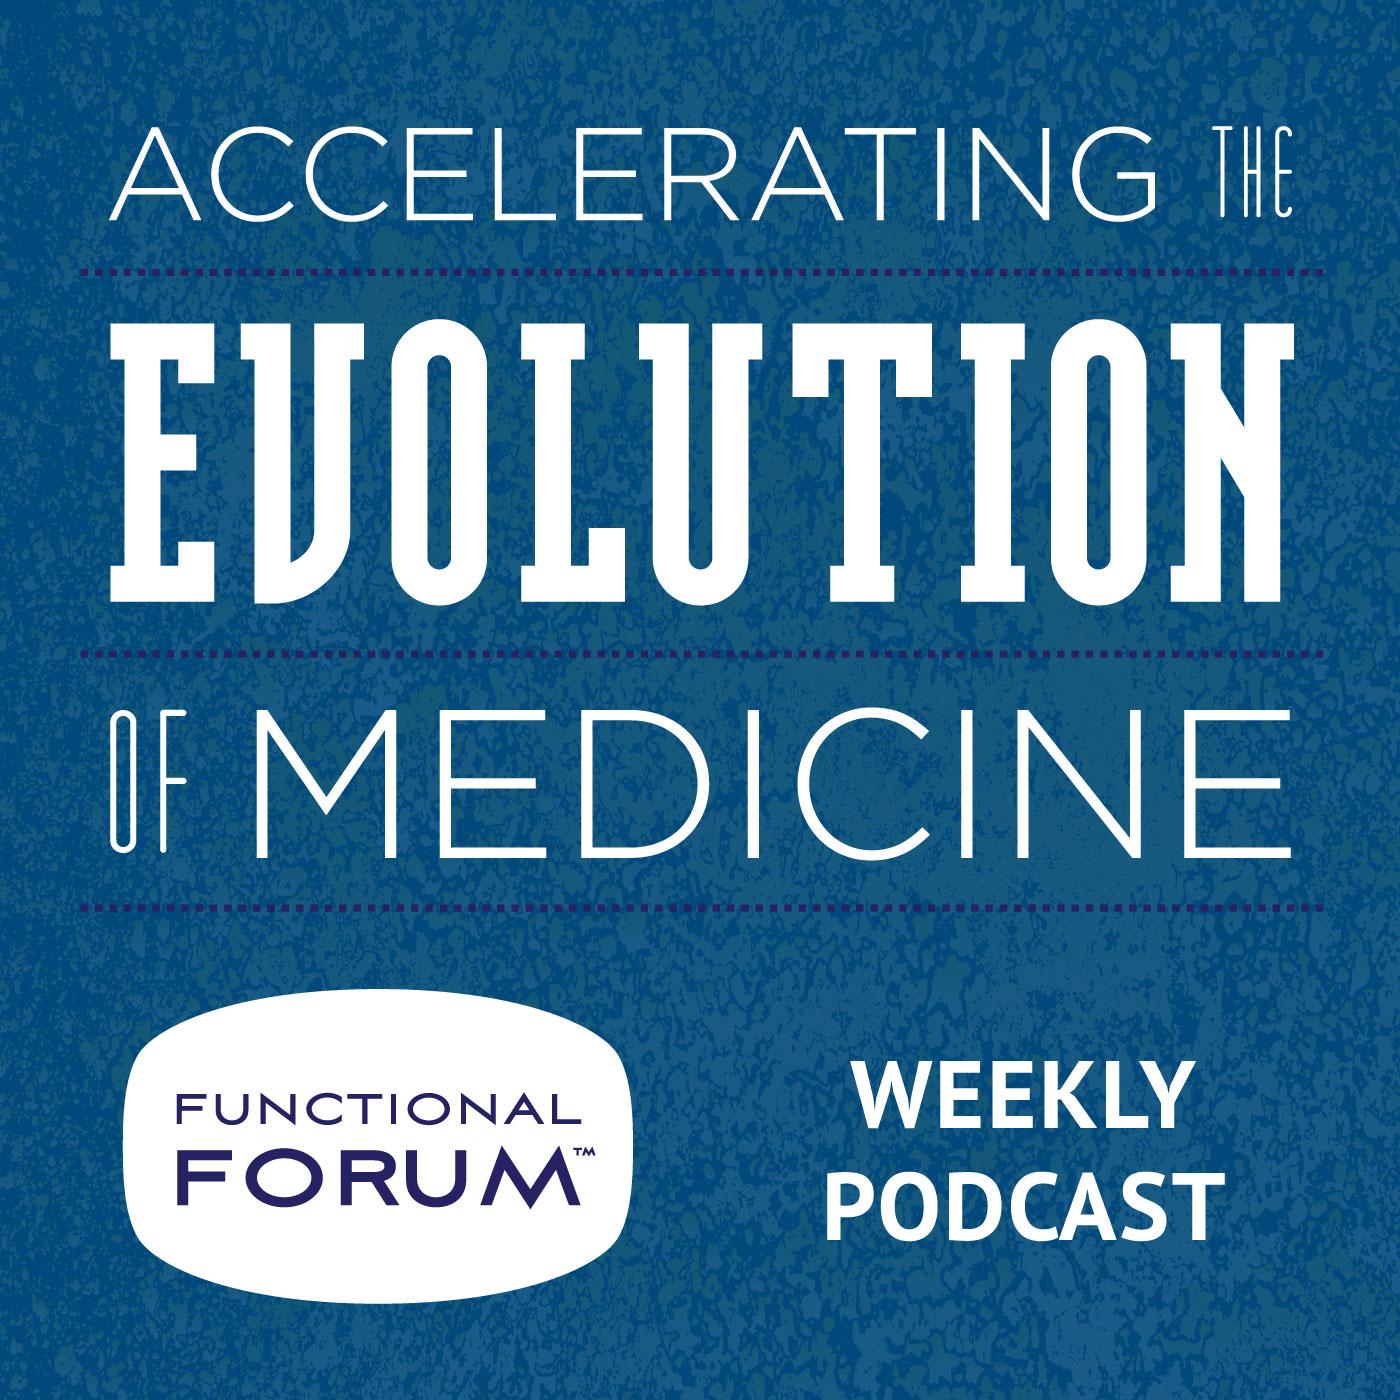 Evolution of Medicine Podcast show art